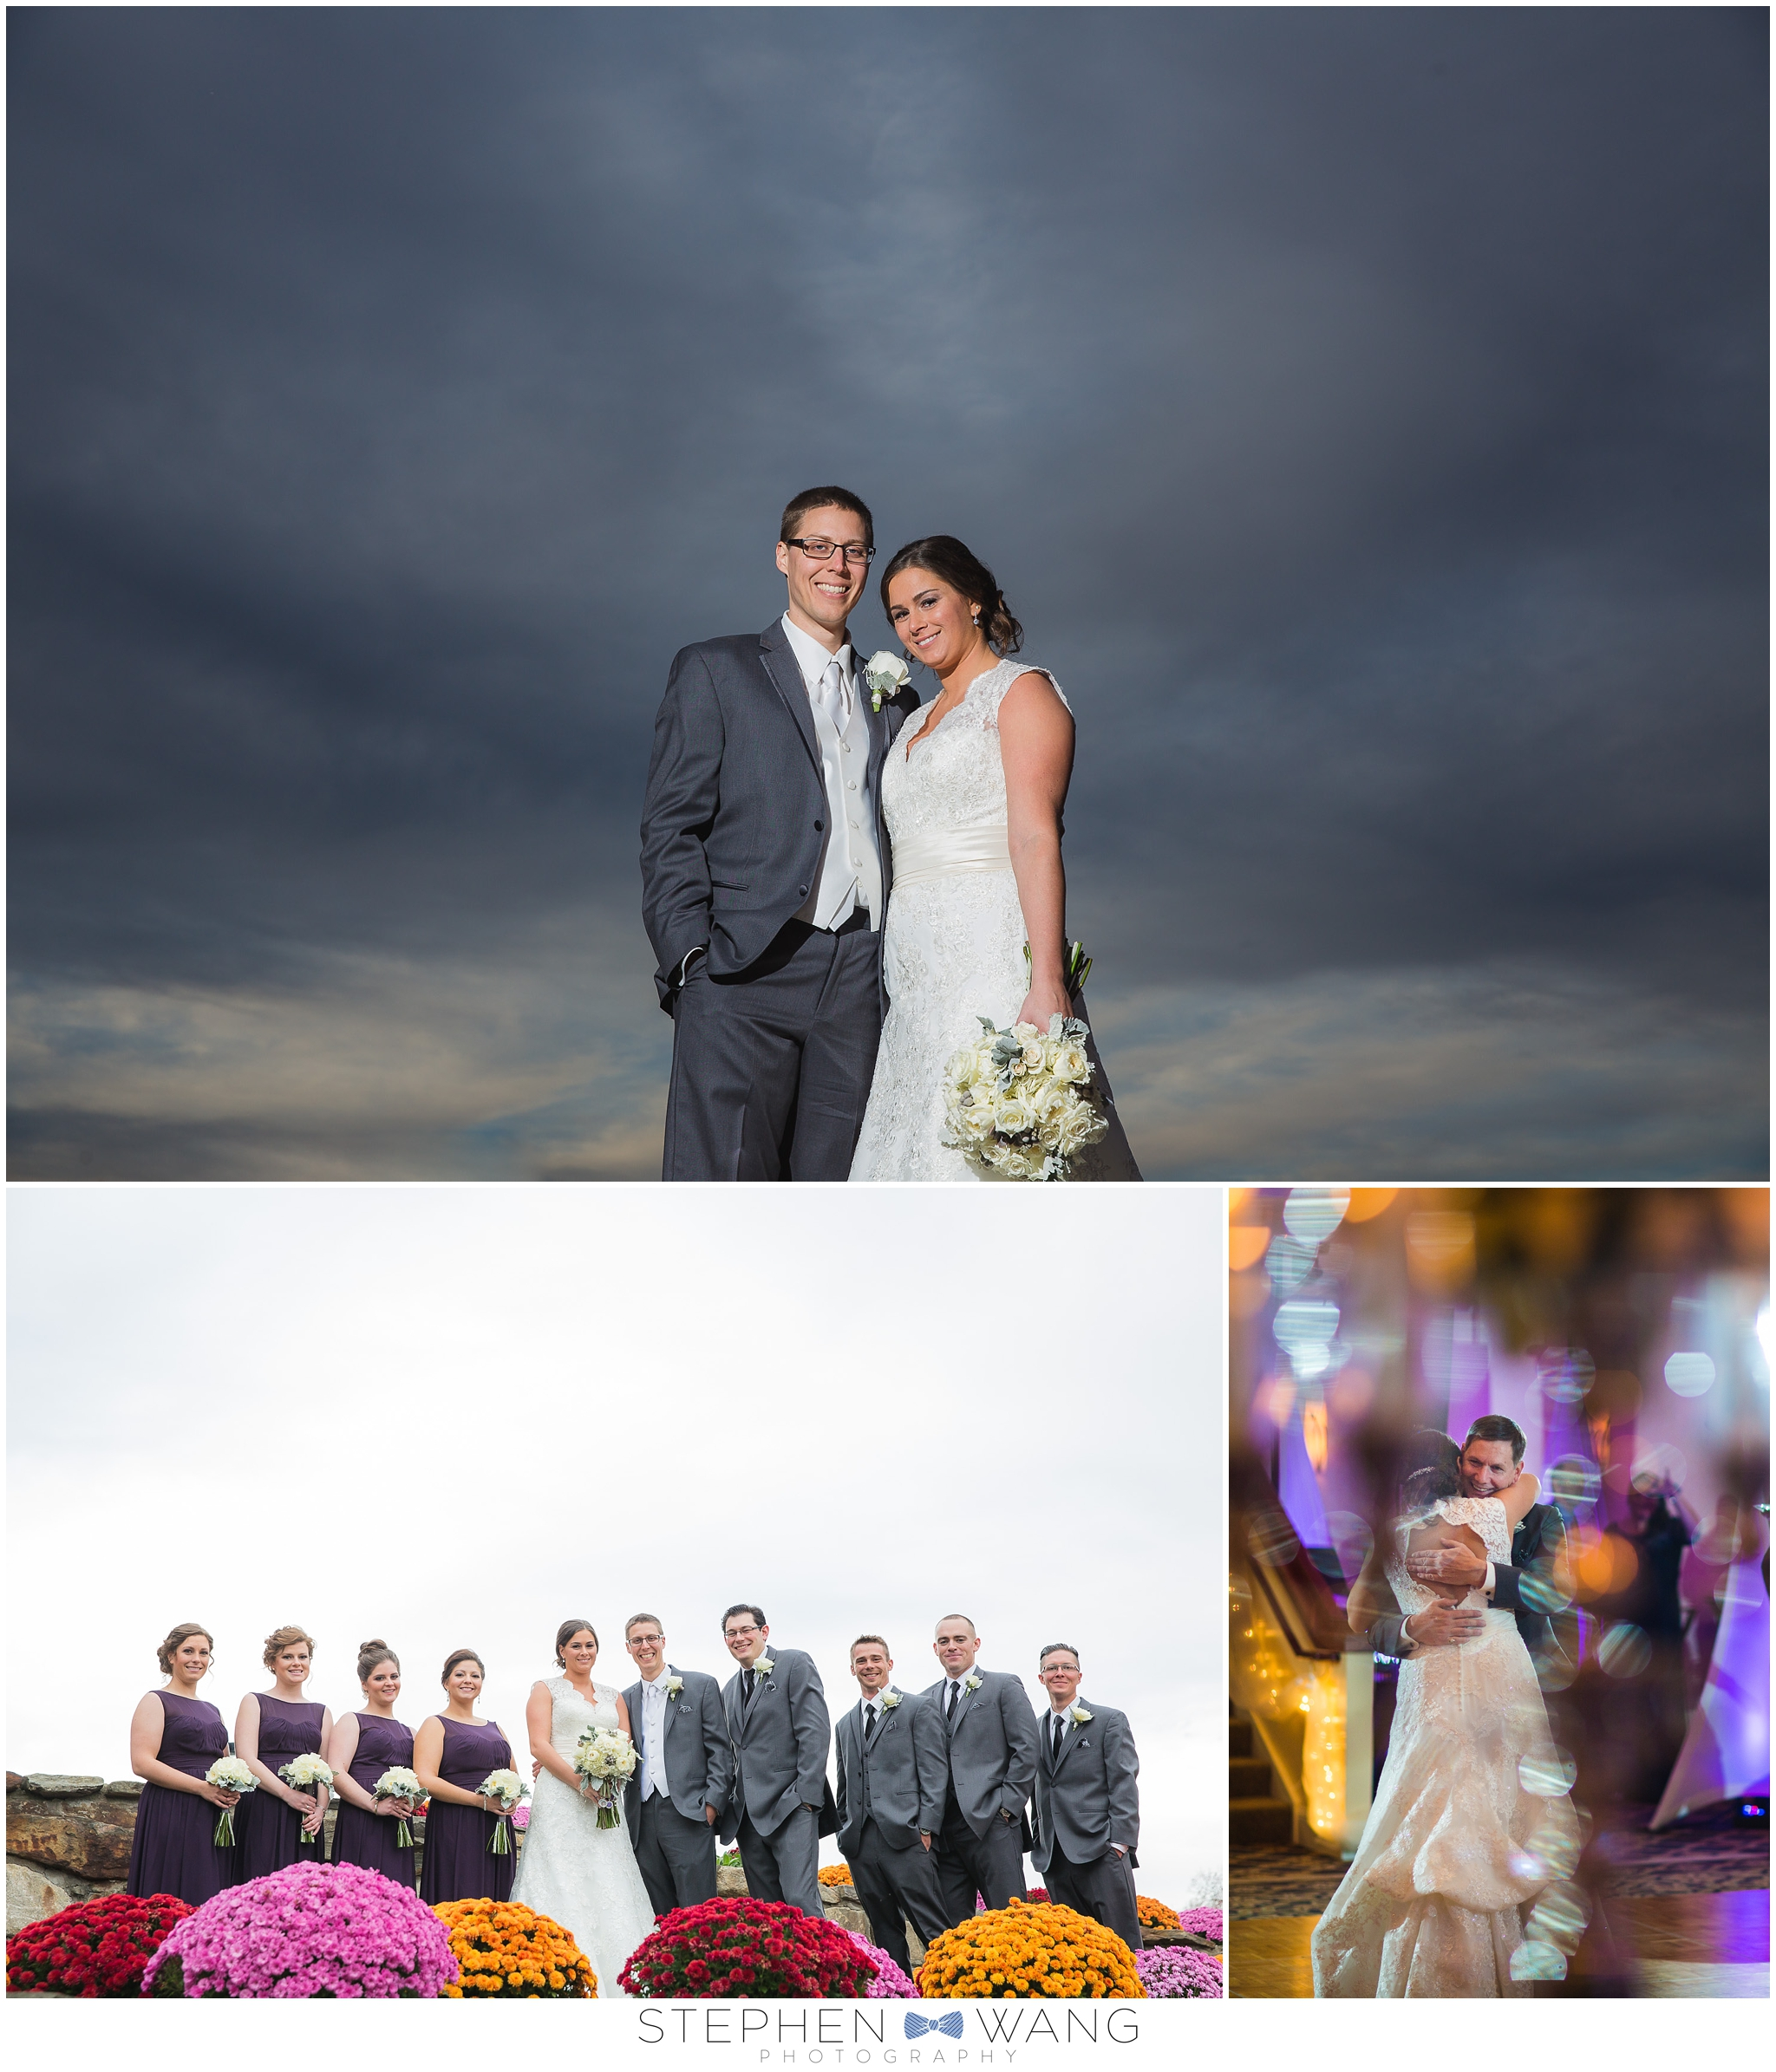 Stephen Wang Photography Wedding Photographer Connecticut CT-12-24_0014.jpg